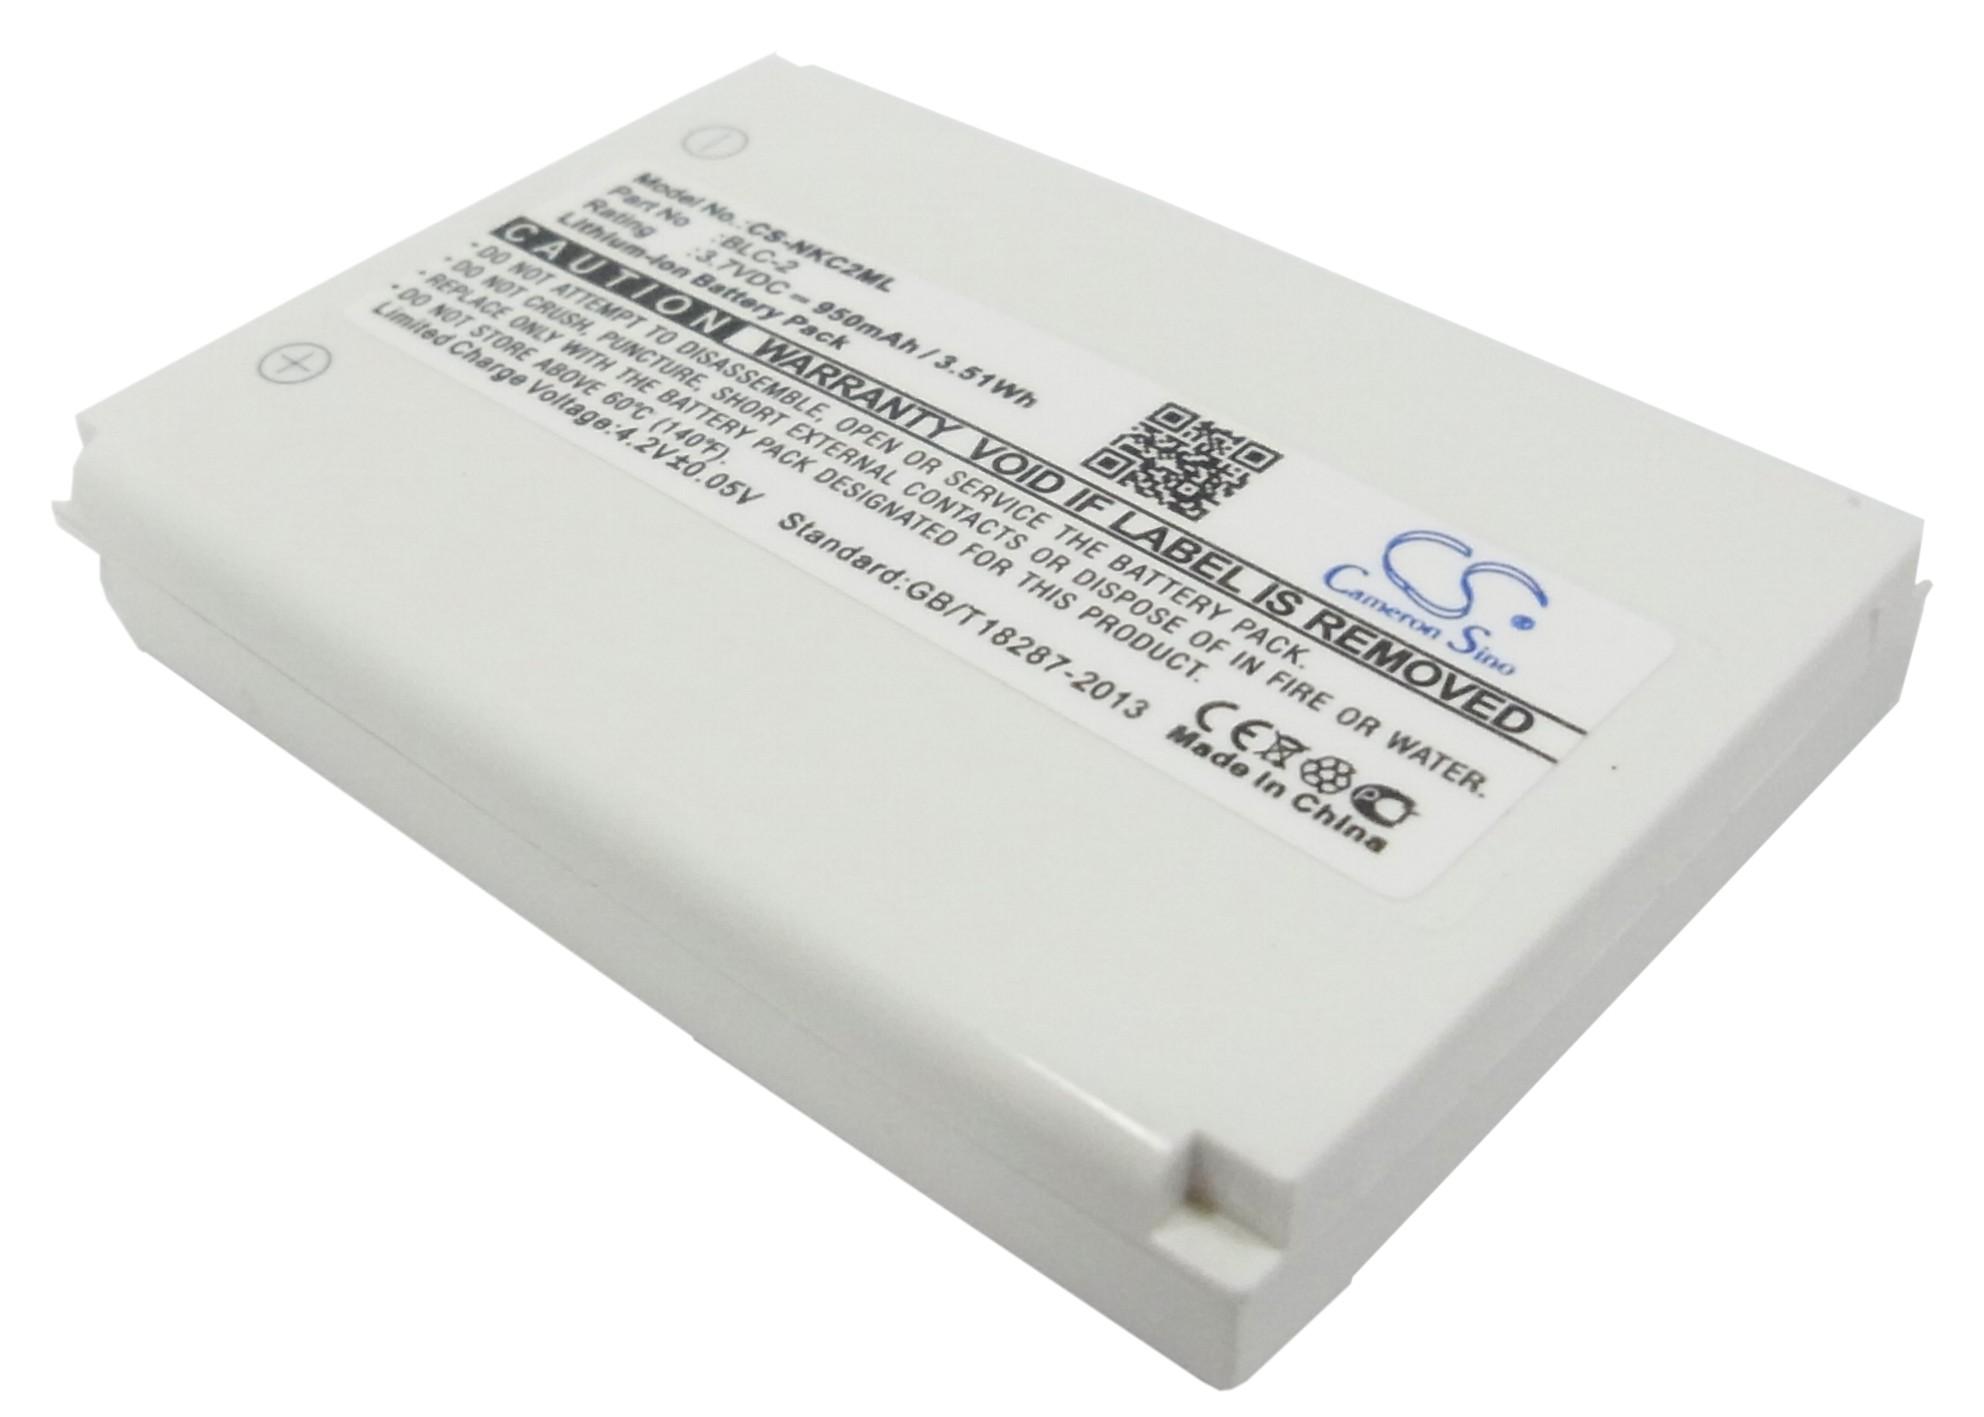 Cameron Sino baterie do mobilů pro NOKIA 3510 3.7V Li-ion 950mAh černá - neoriginální